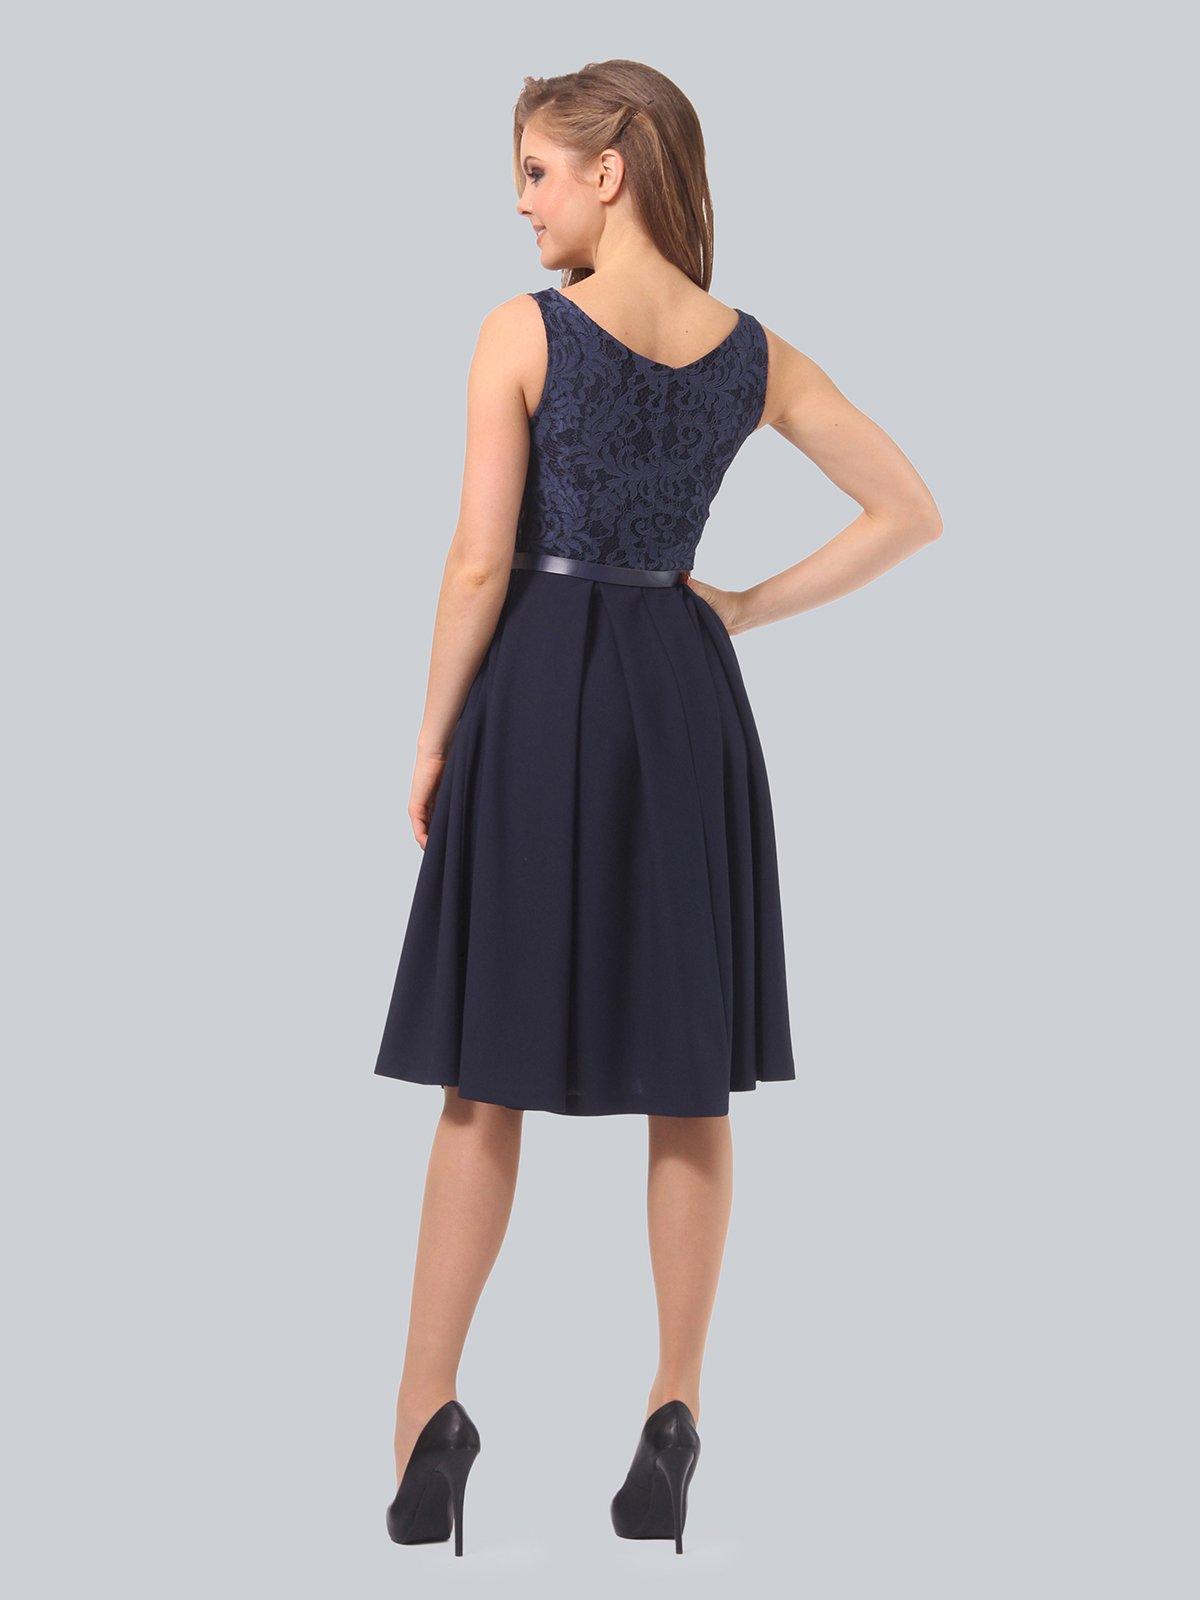 Платье темно-синее | 3863266 | фото 4